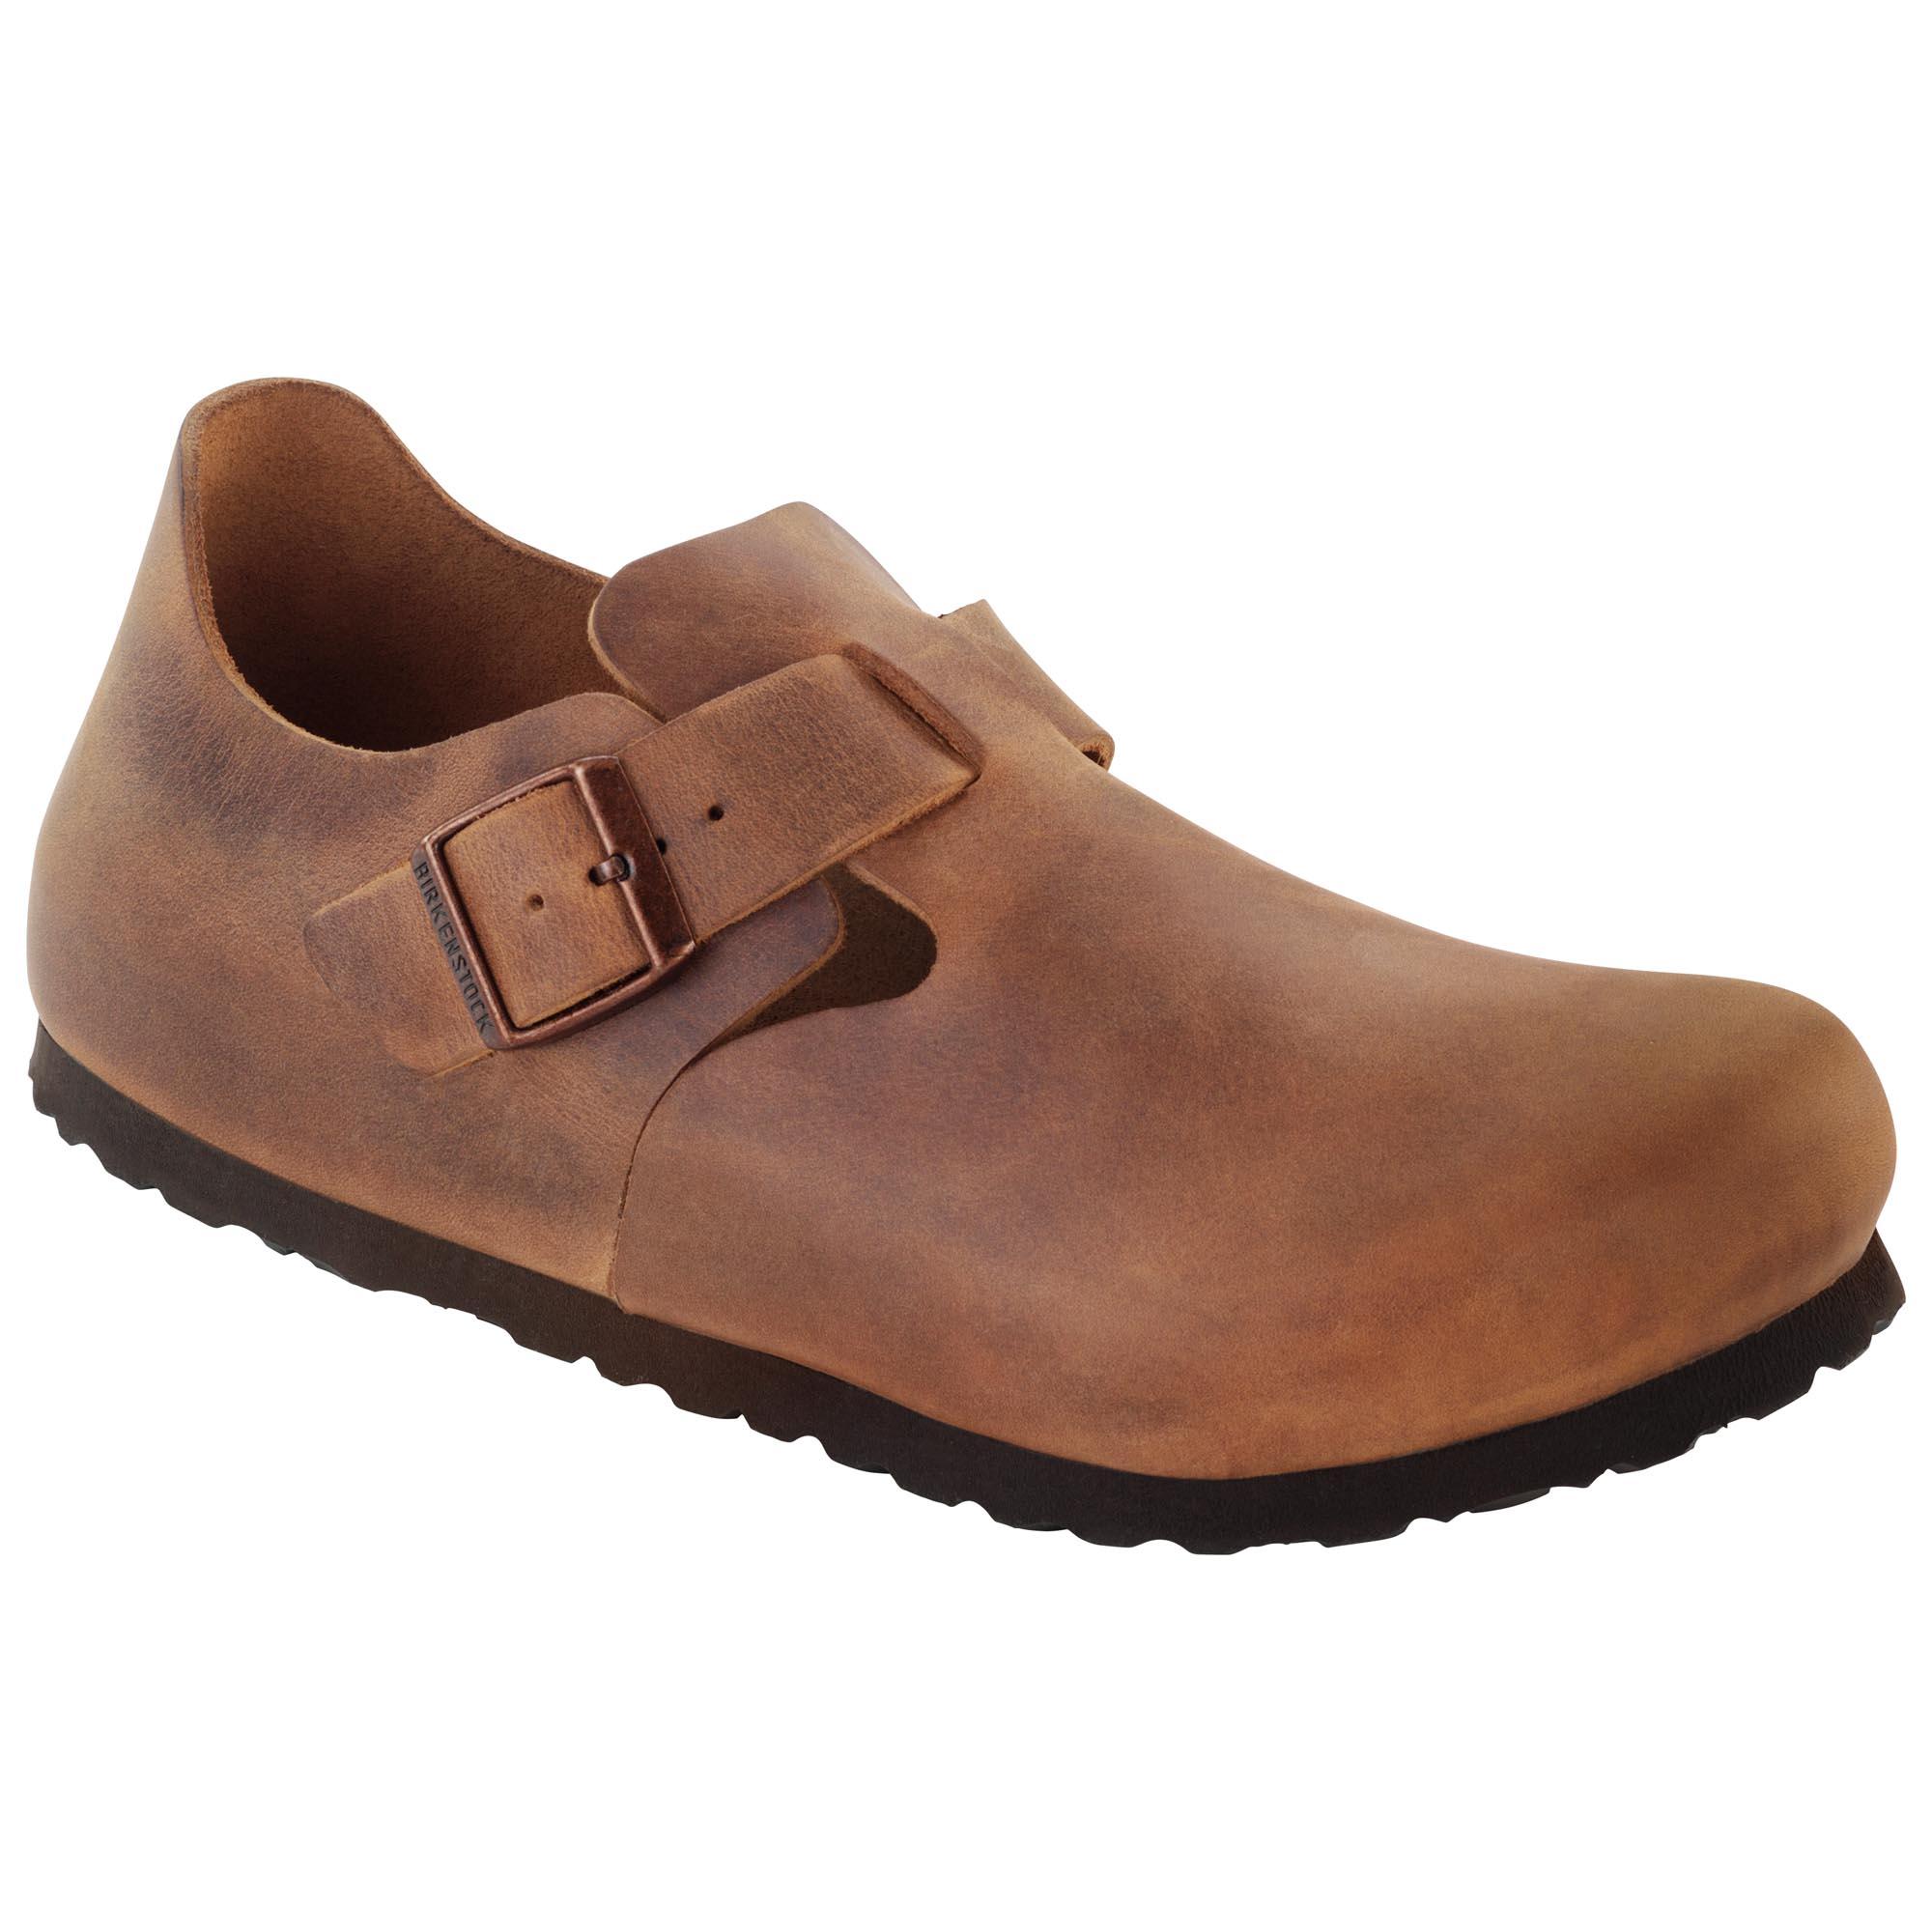 16d3480ece99 London Natural Leather Antique Brown